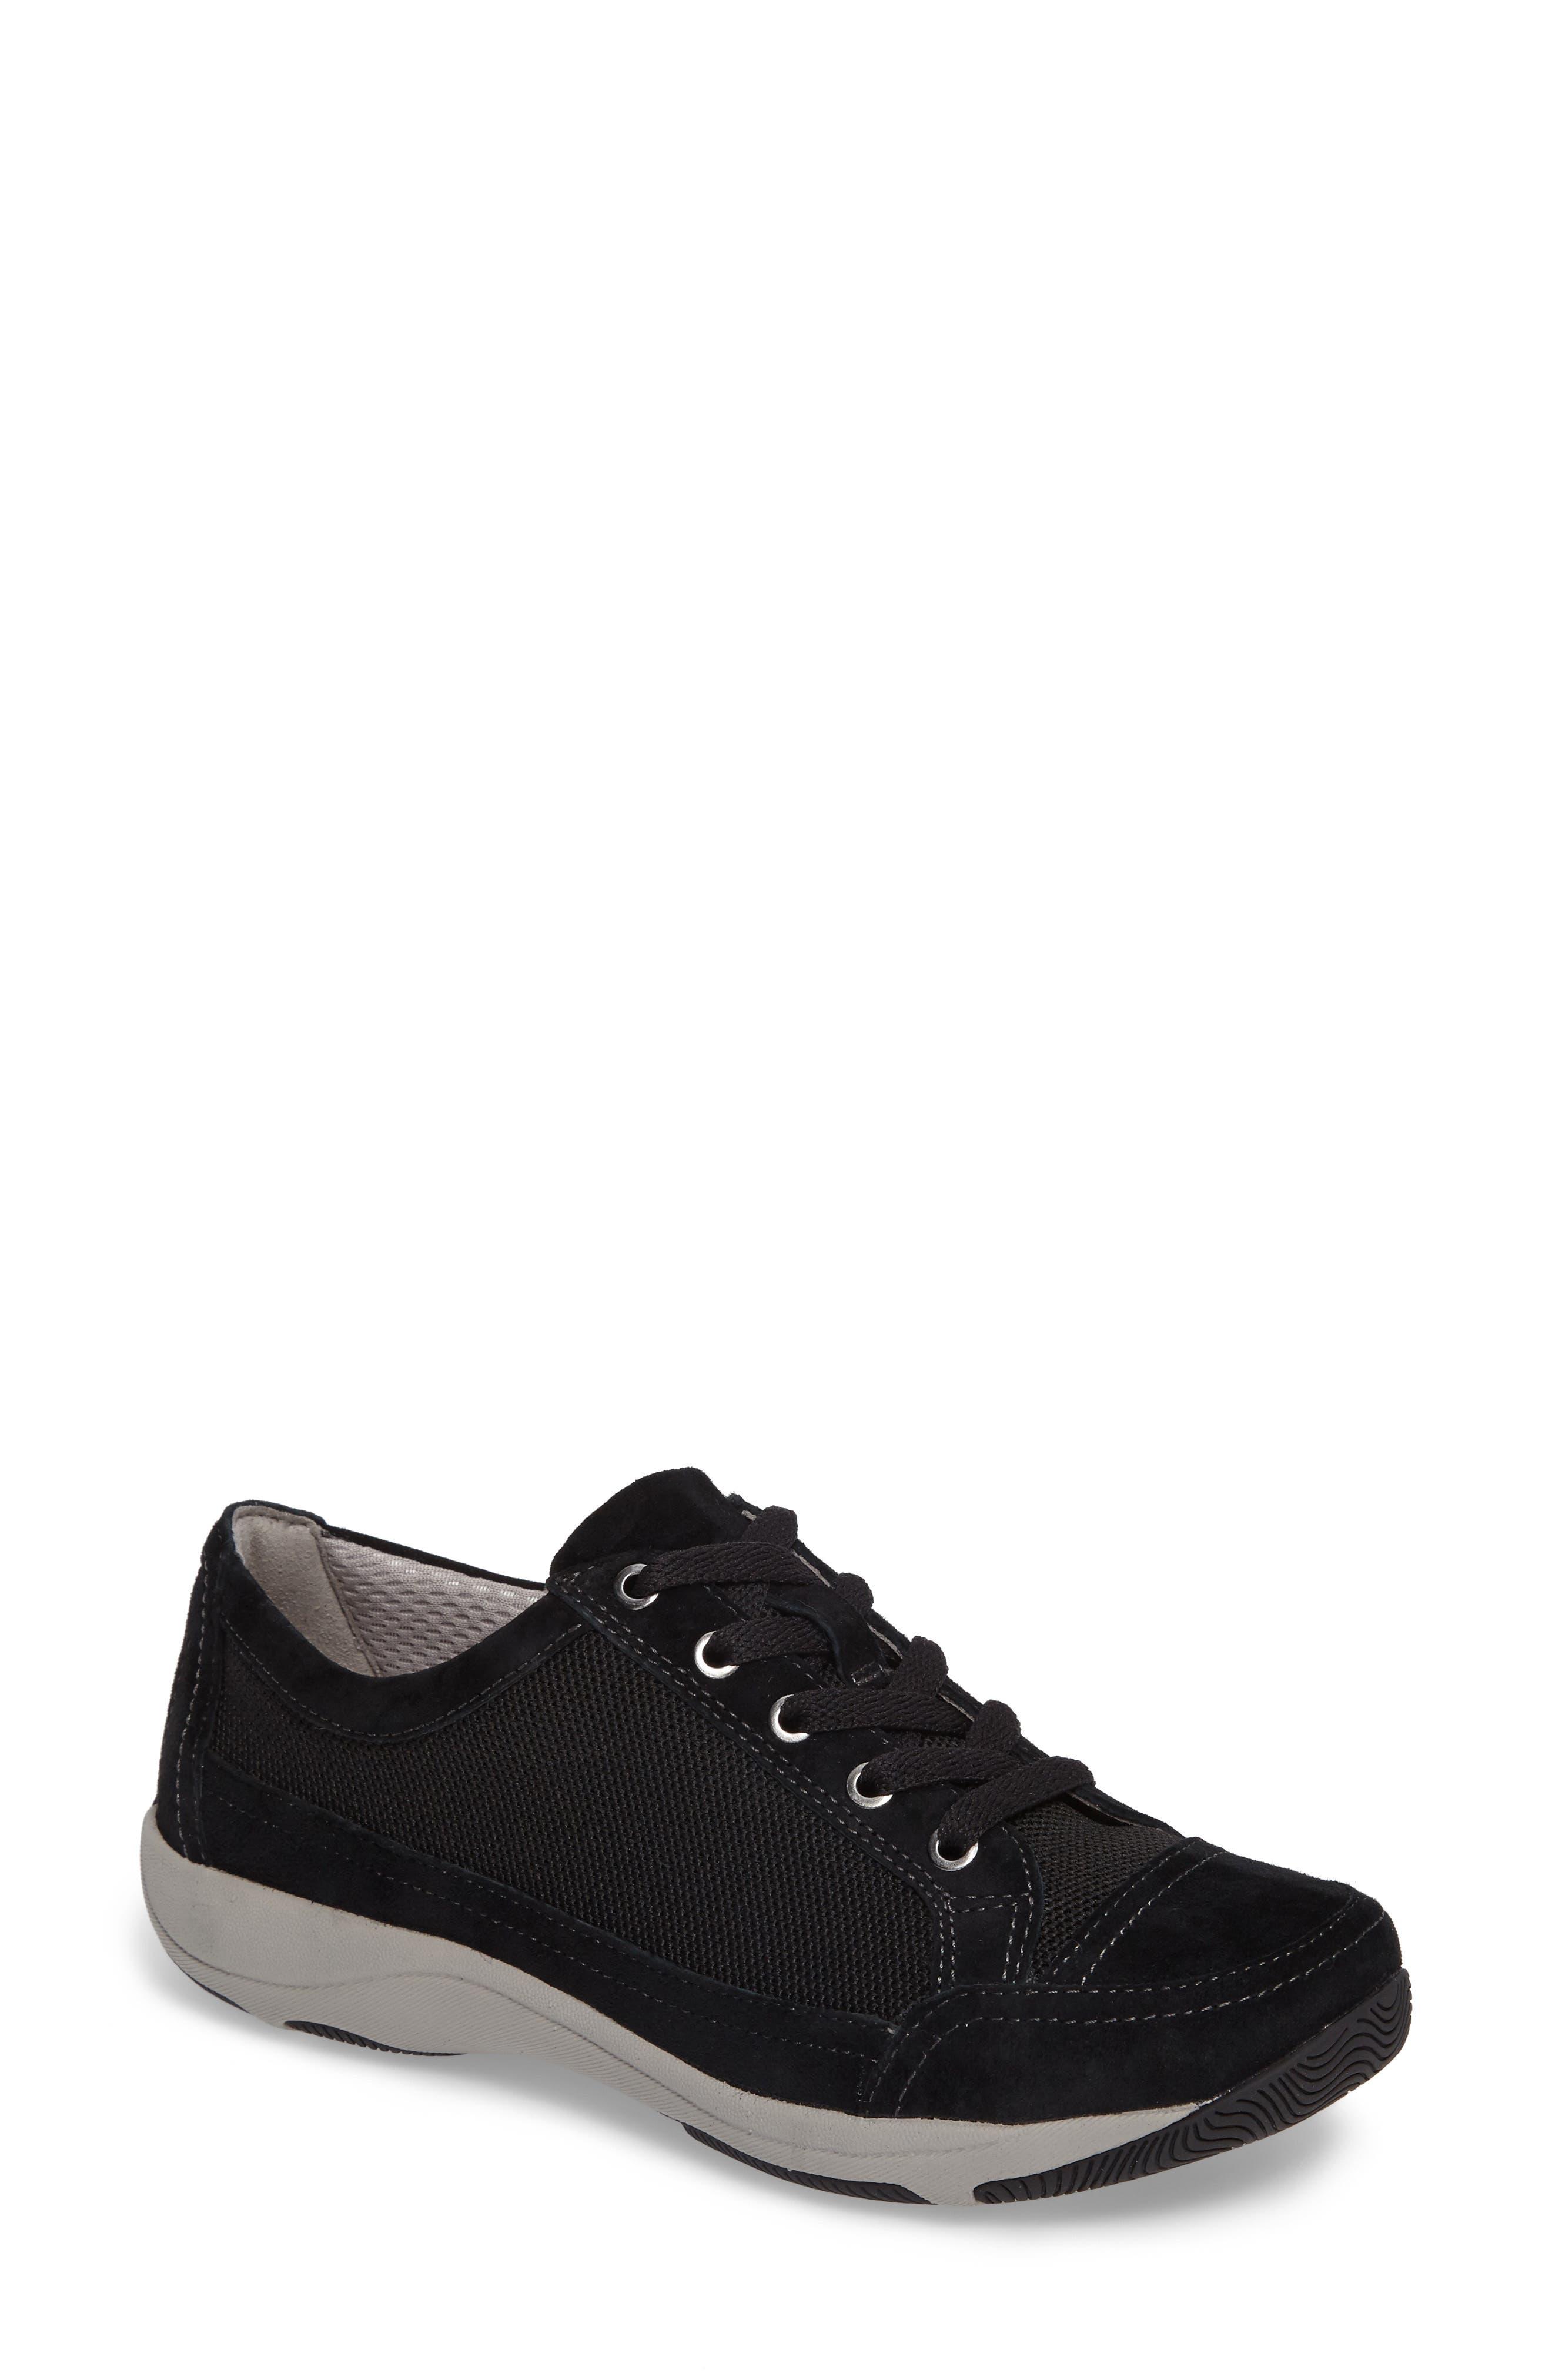 Harmony Sneaker,                         Main,                         color, 001